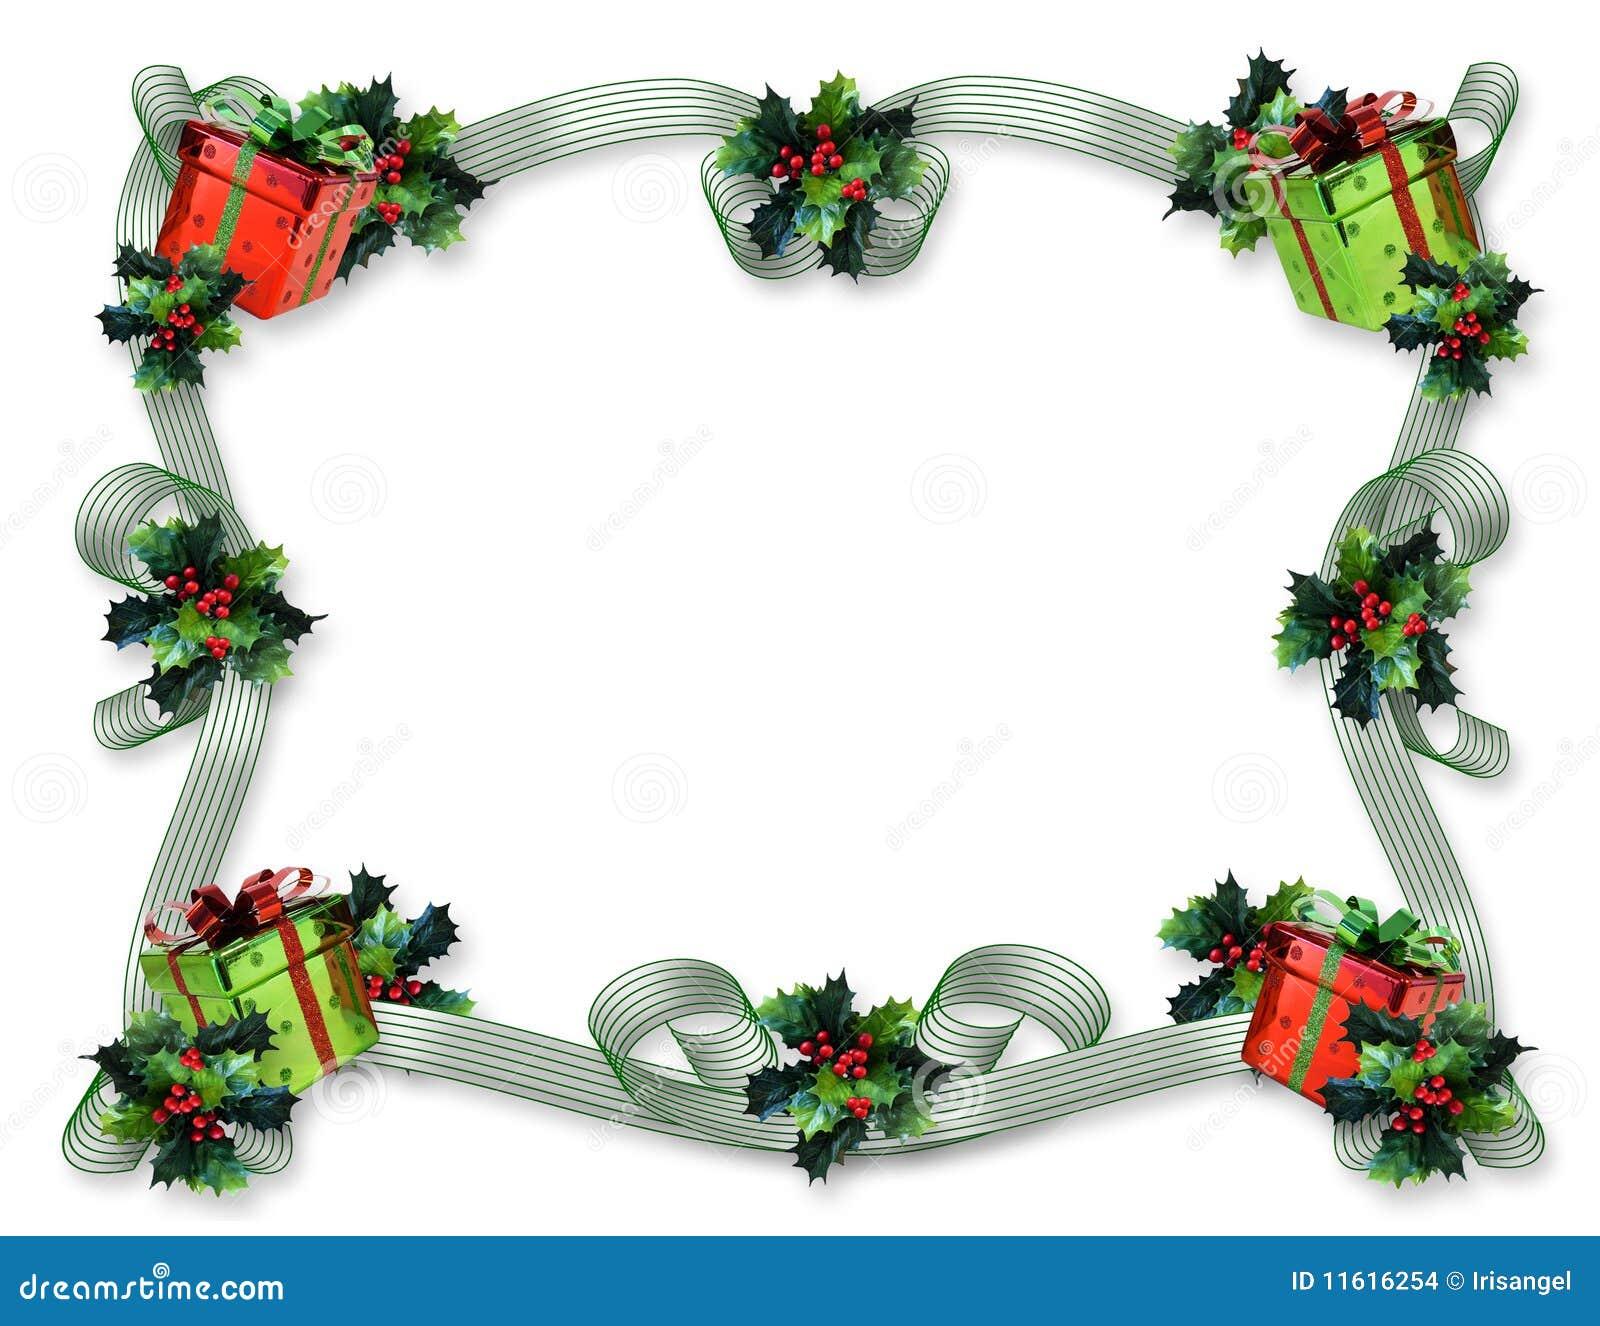 Christmas Border Ribbons Holly Presents Stock Illustration ...